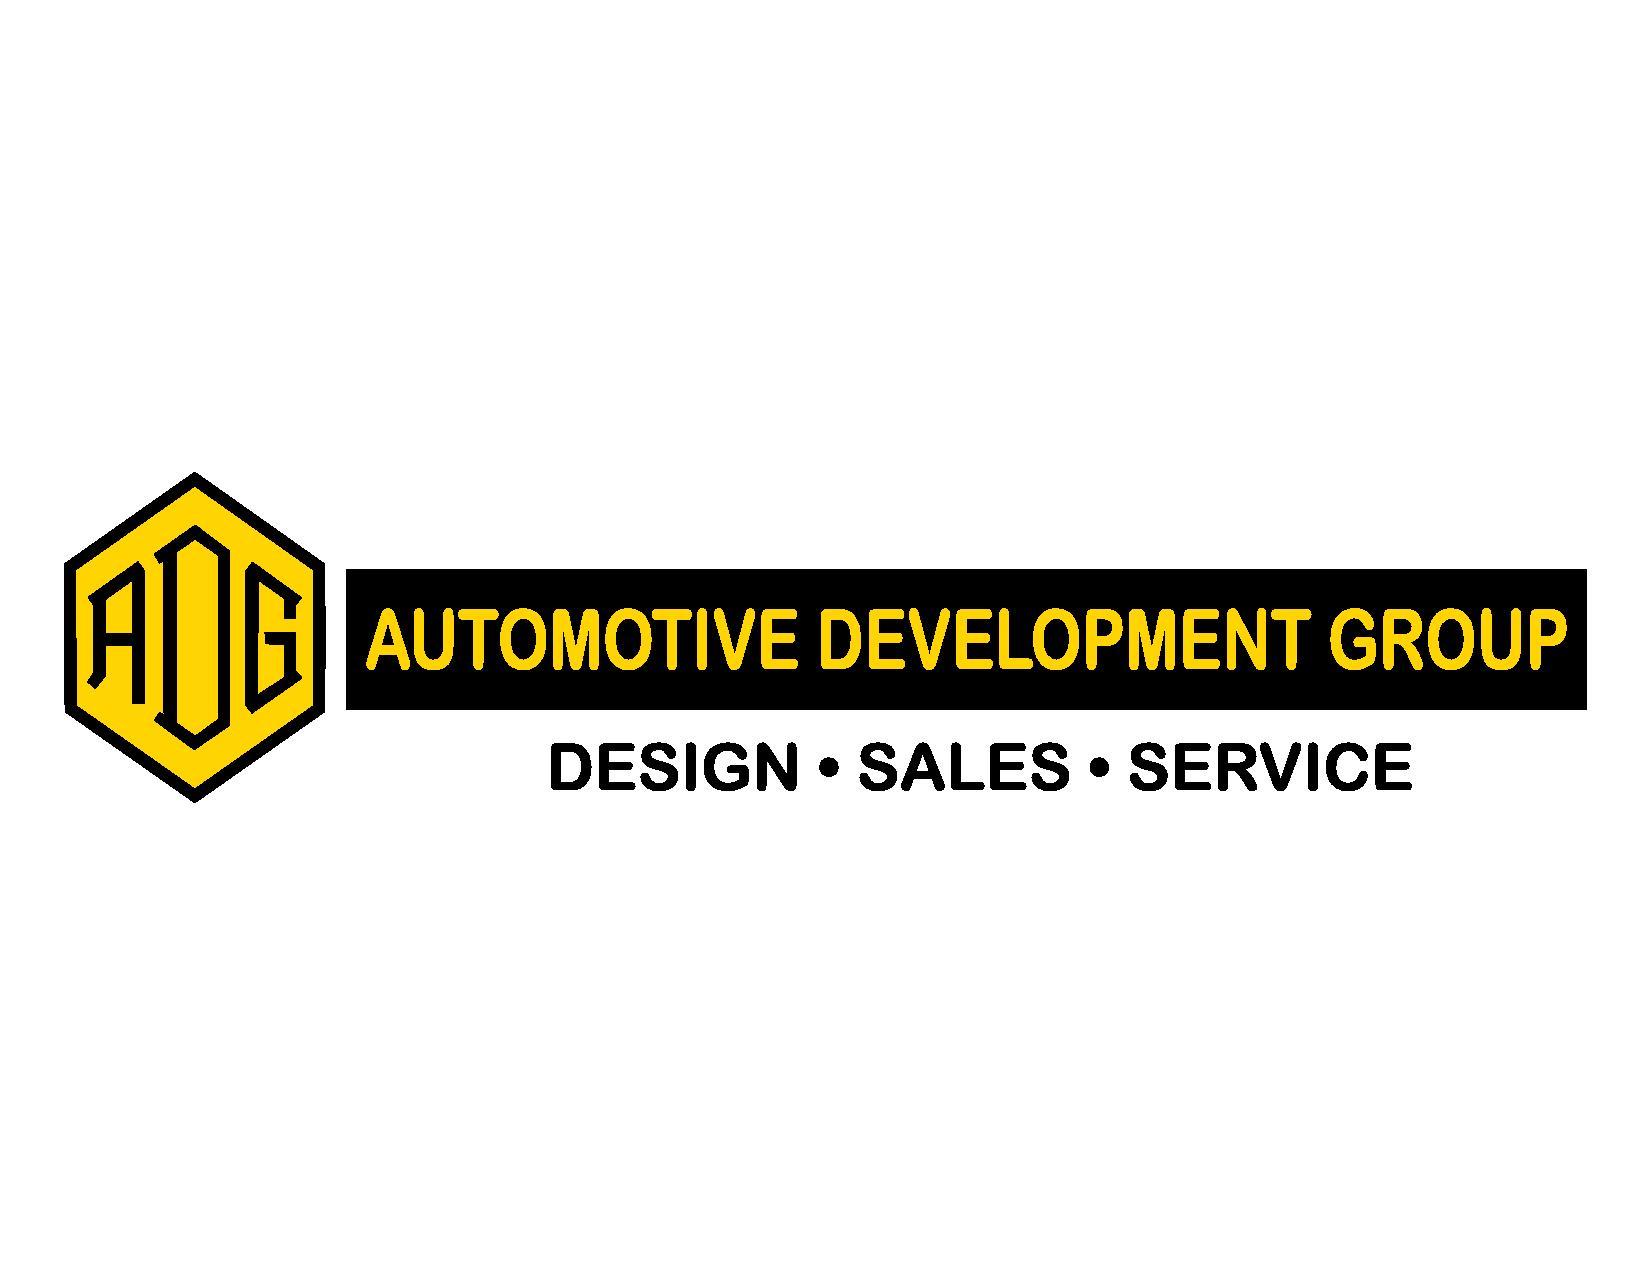 Automotive Development Group